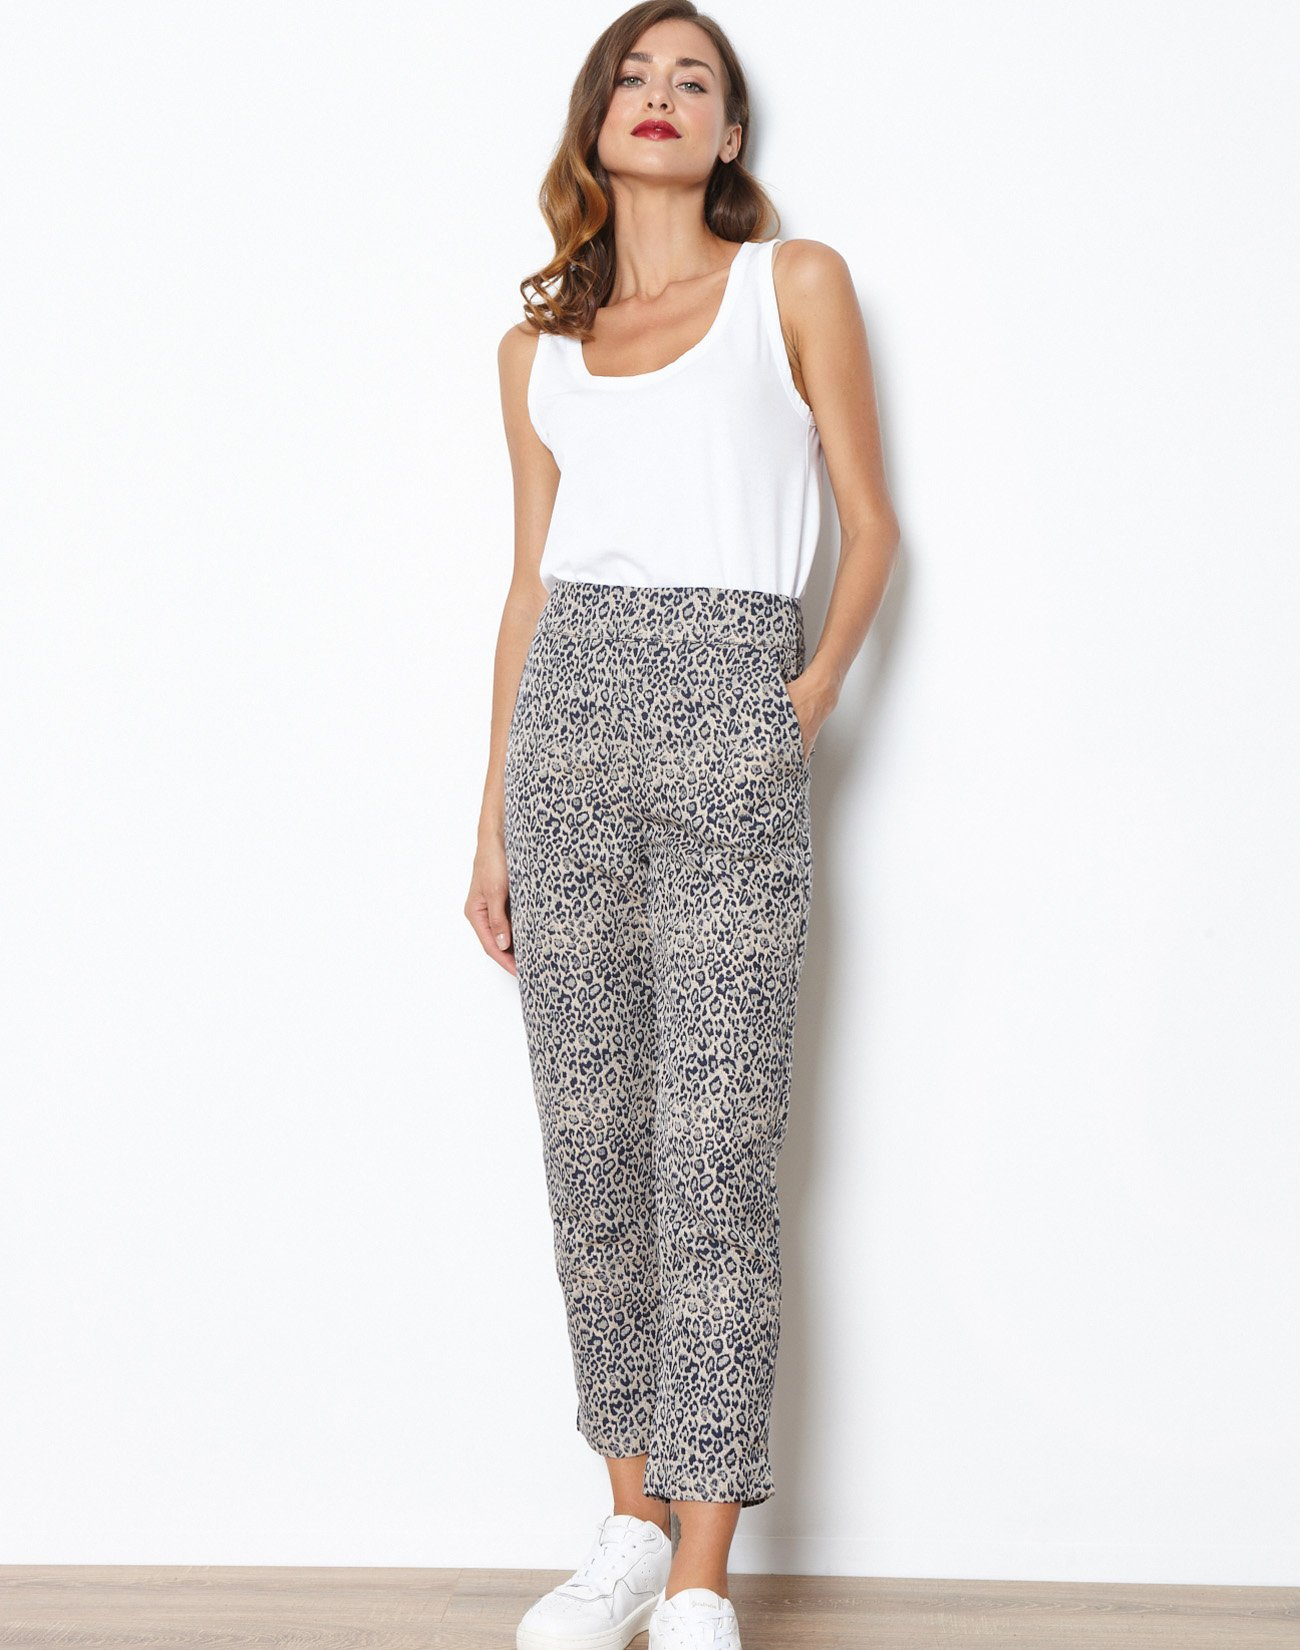 Jacquard animal print trousers